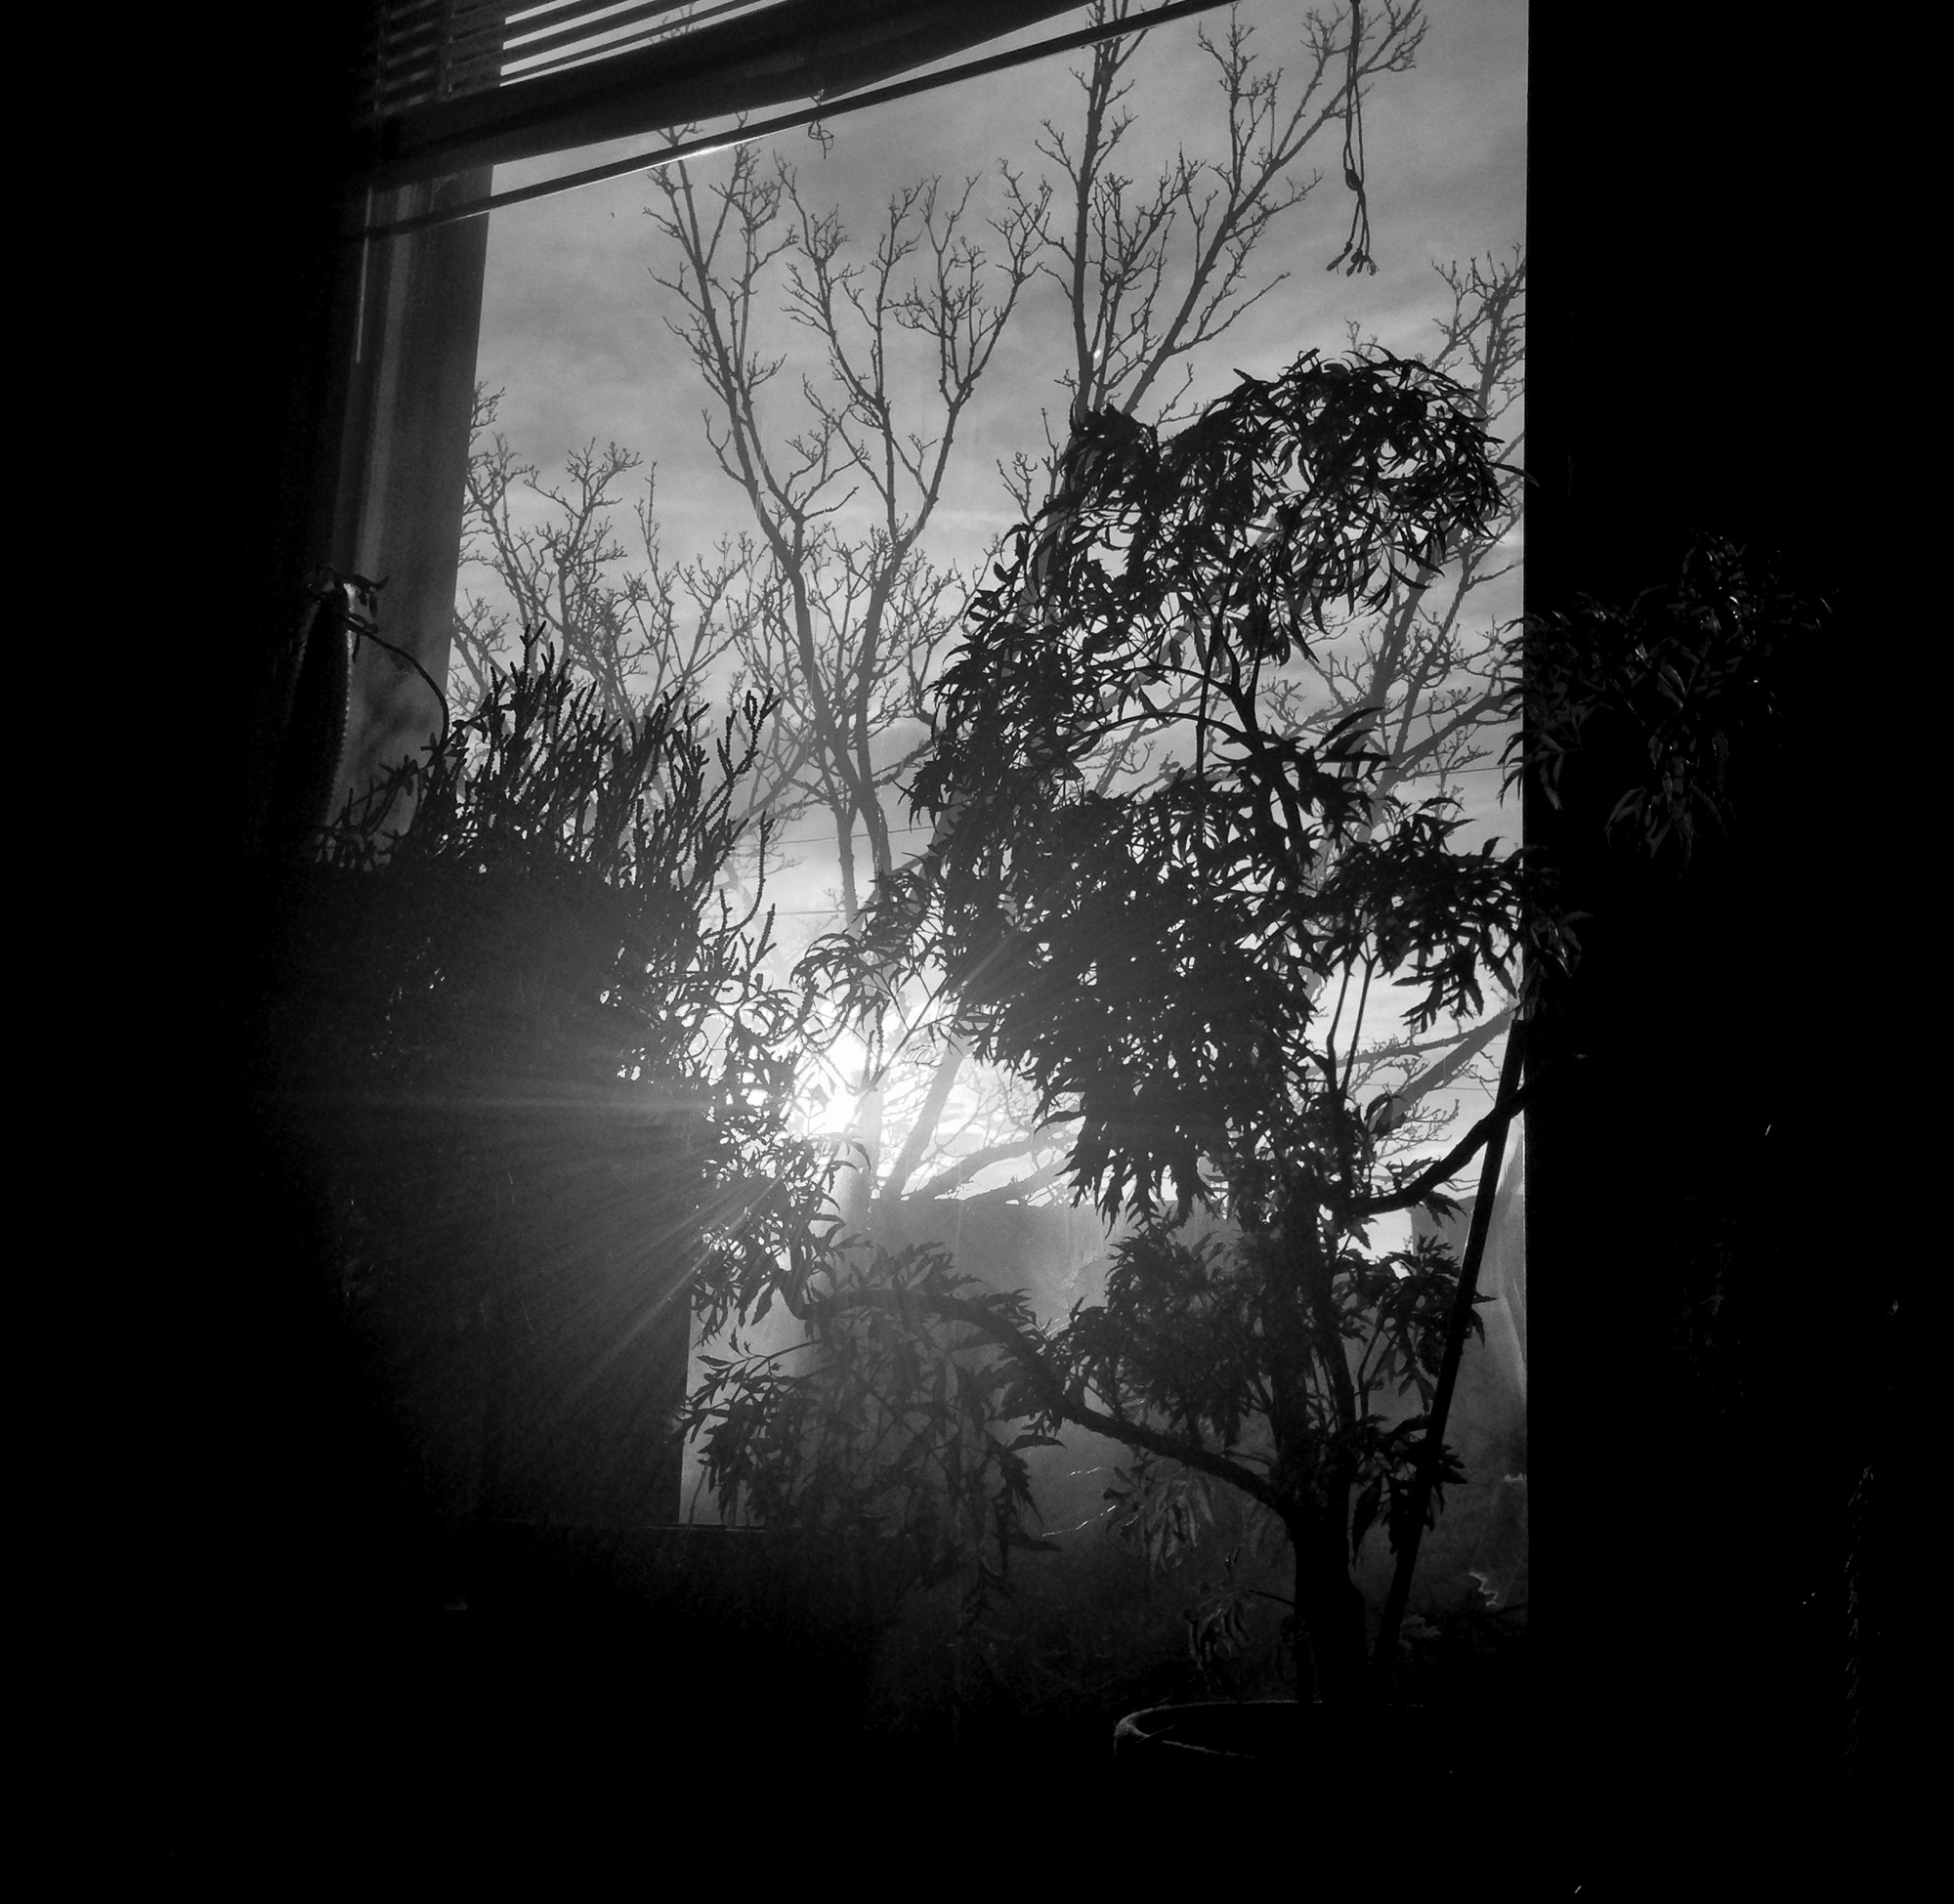 Ming Aralia in front of a window / Darker than Green